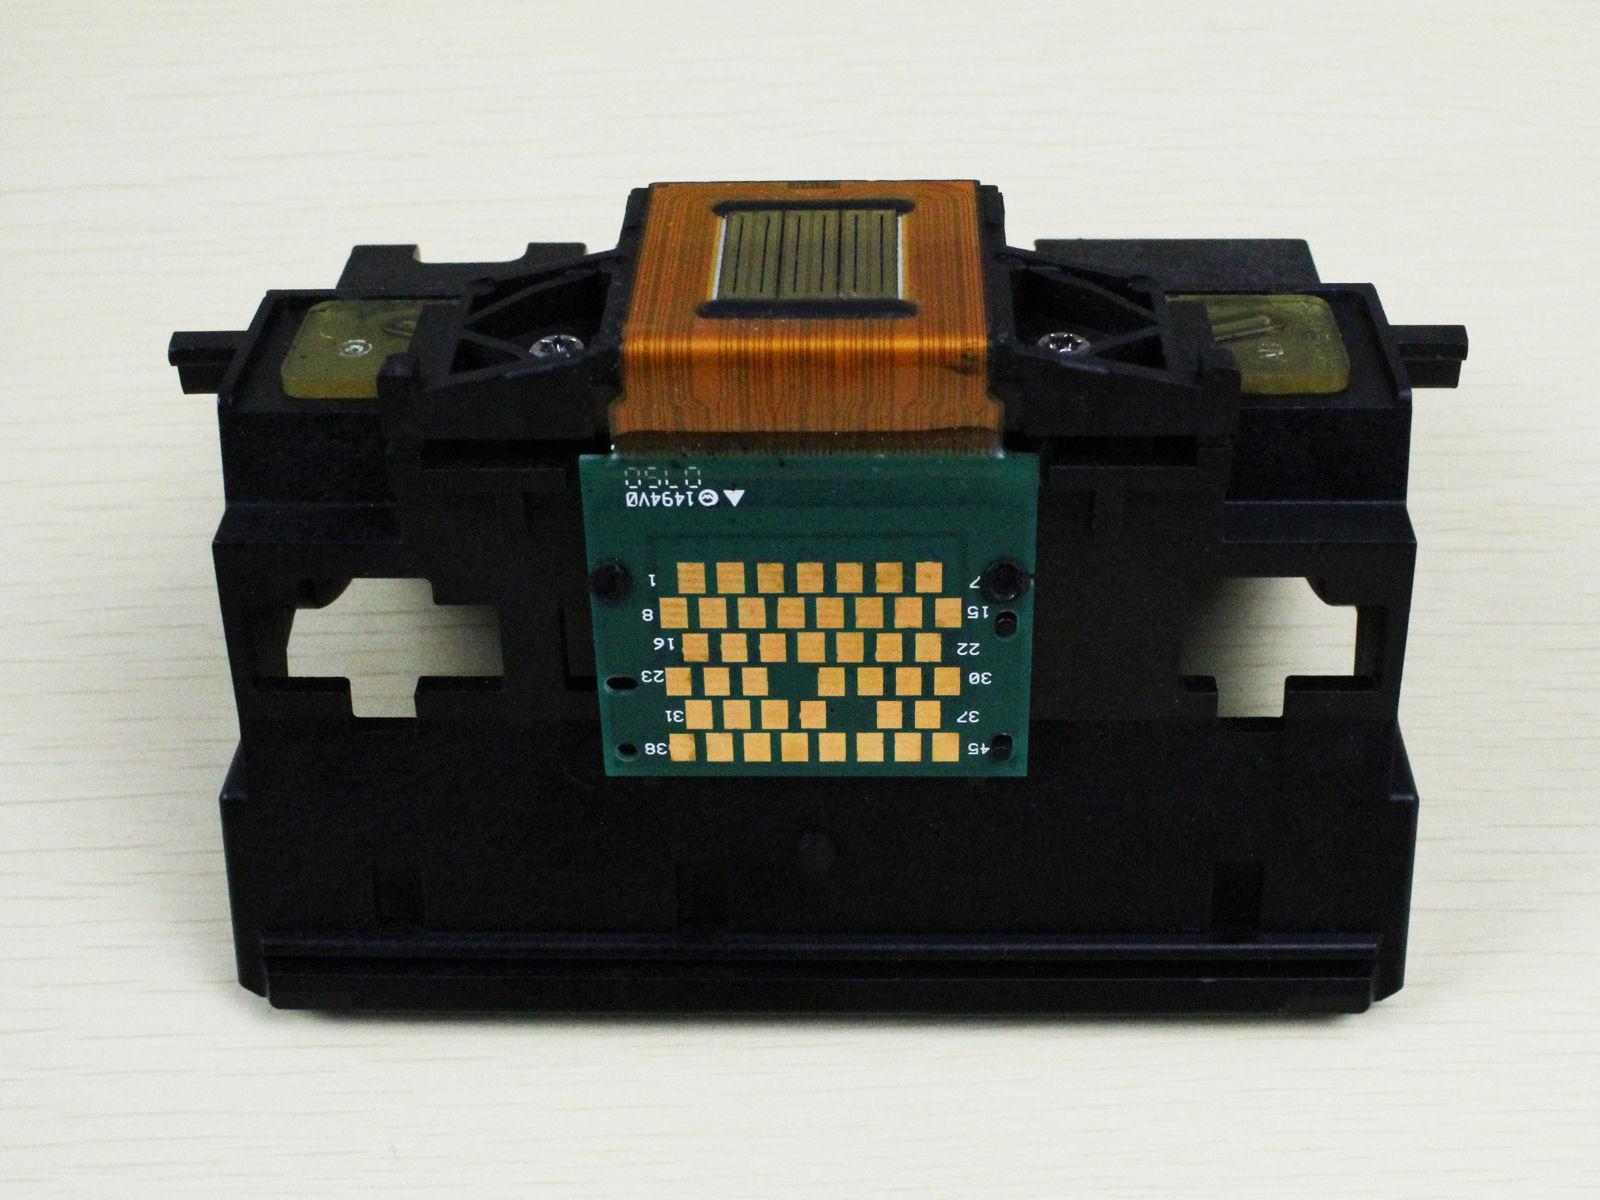 Genuine KODAK 10 Series Printhead Authentic Replacement Part 5000 ESP 357 Hero